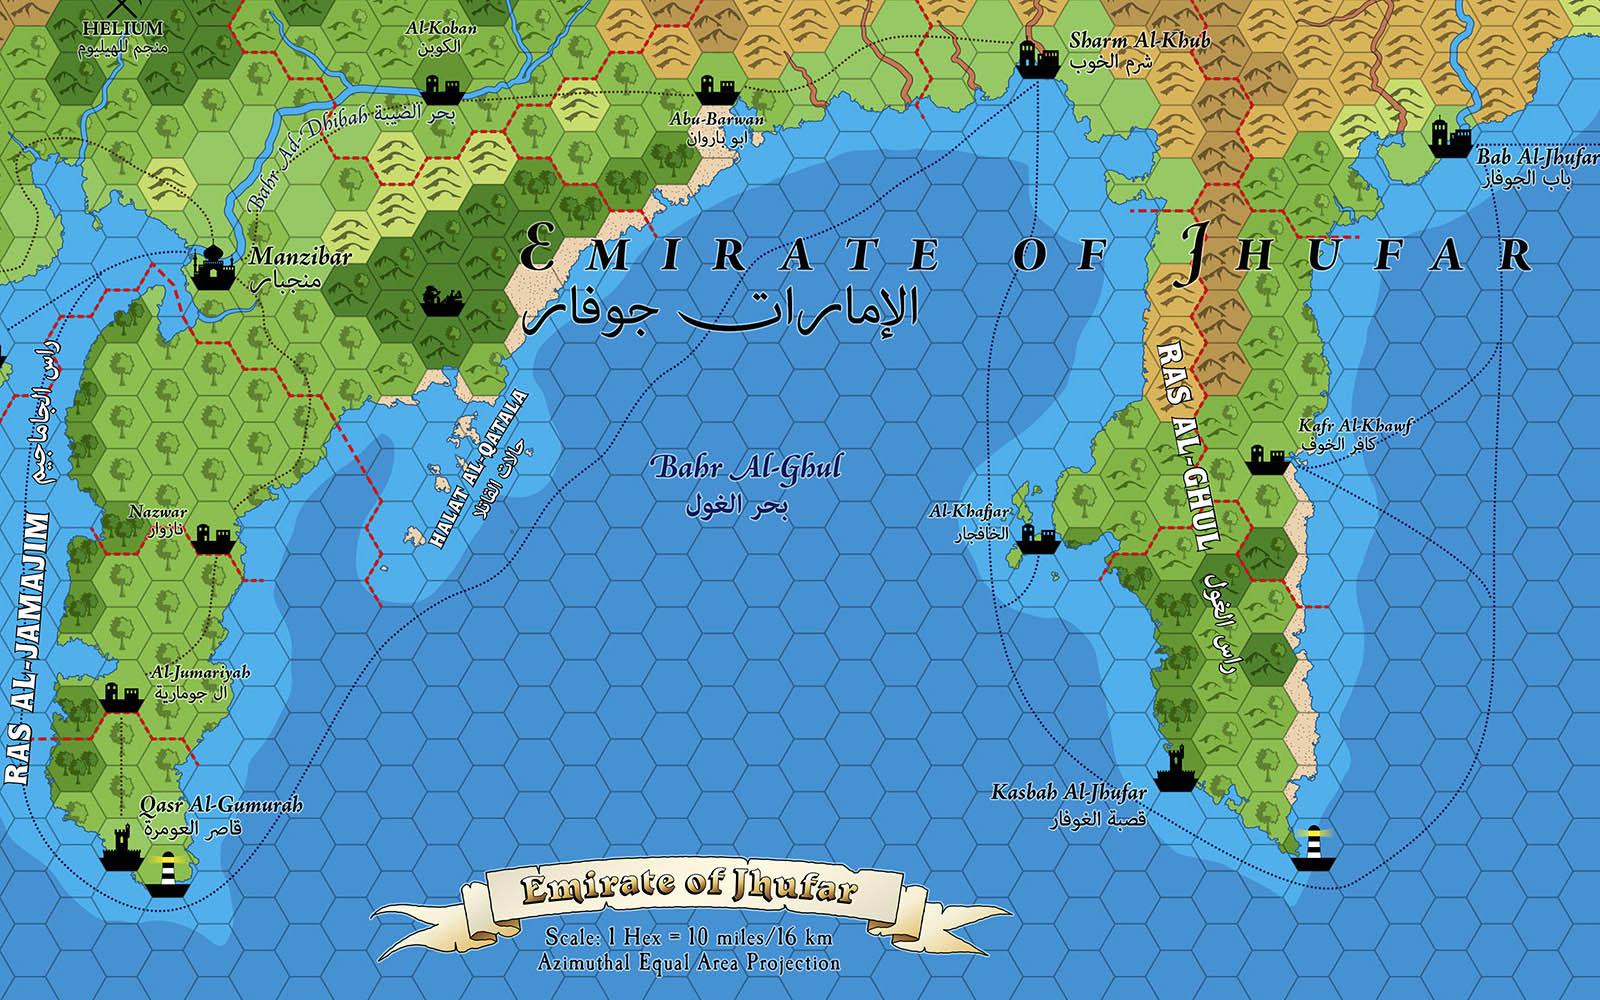 Al-Barami and Jhufar Hex Maps (Patreon)